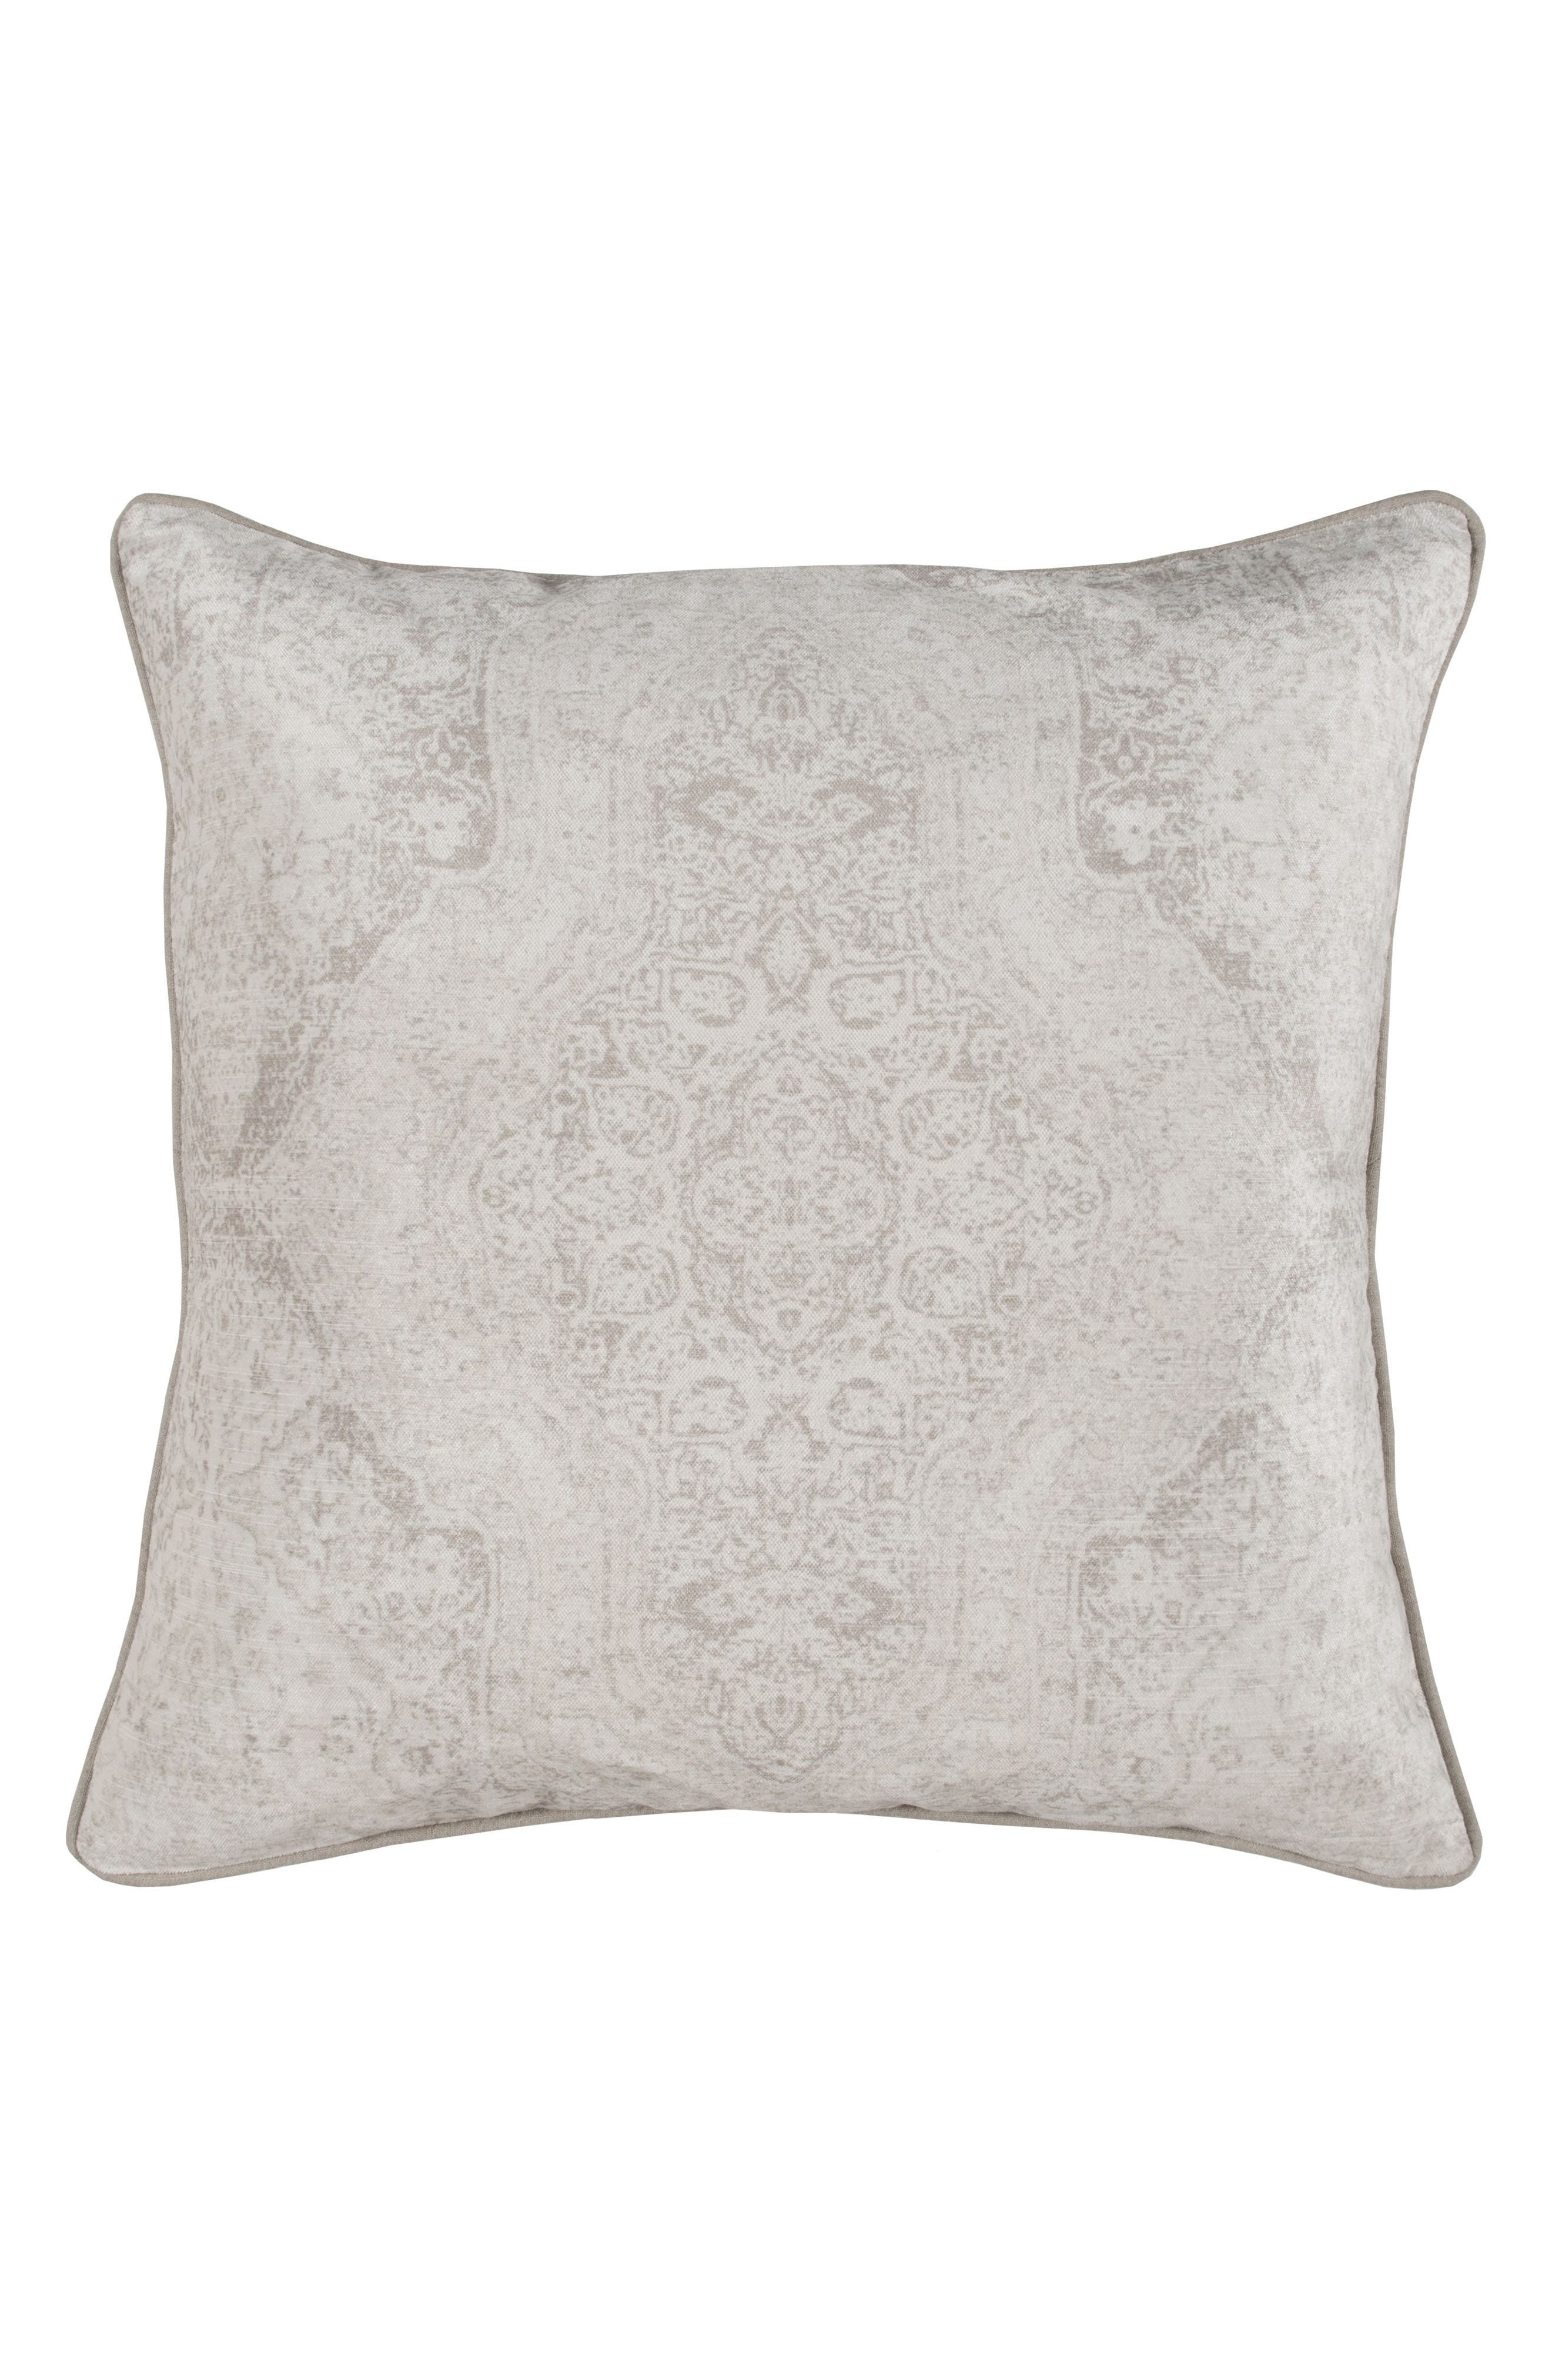 Luri Accent Pillow,                         Main,                         color, NATURAL